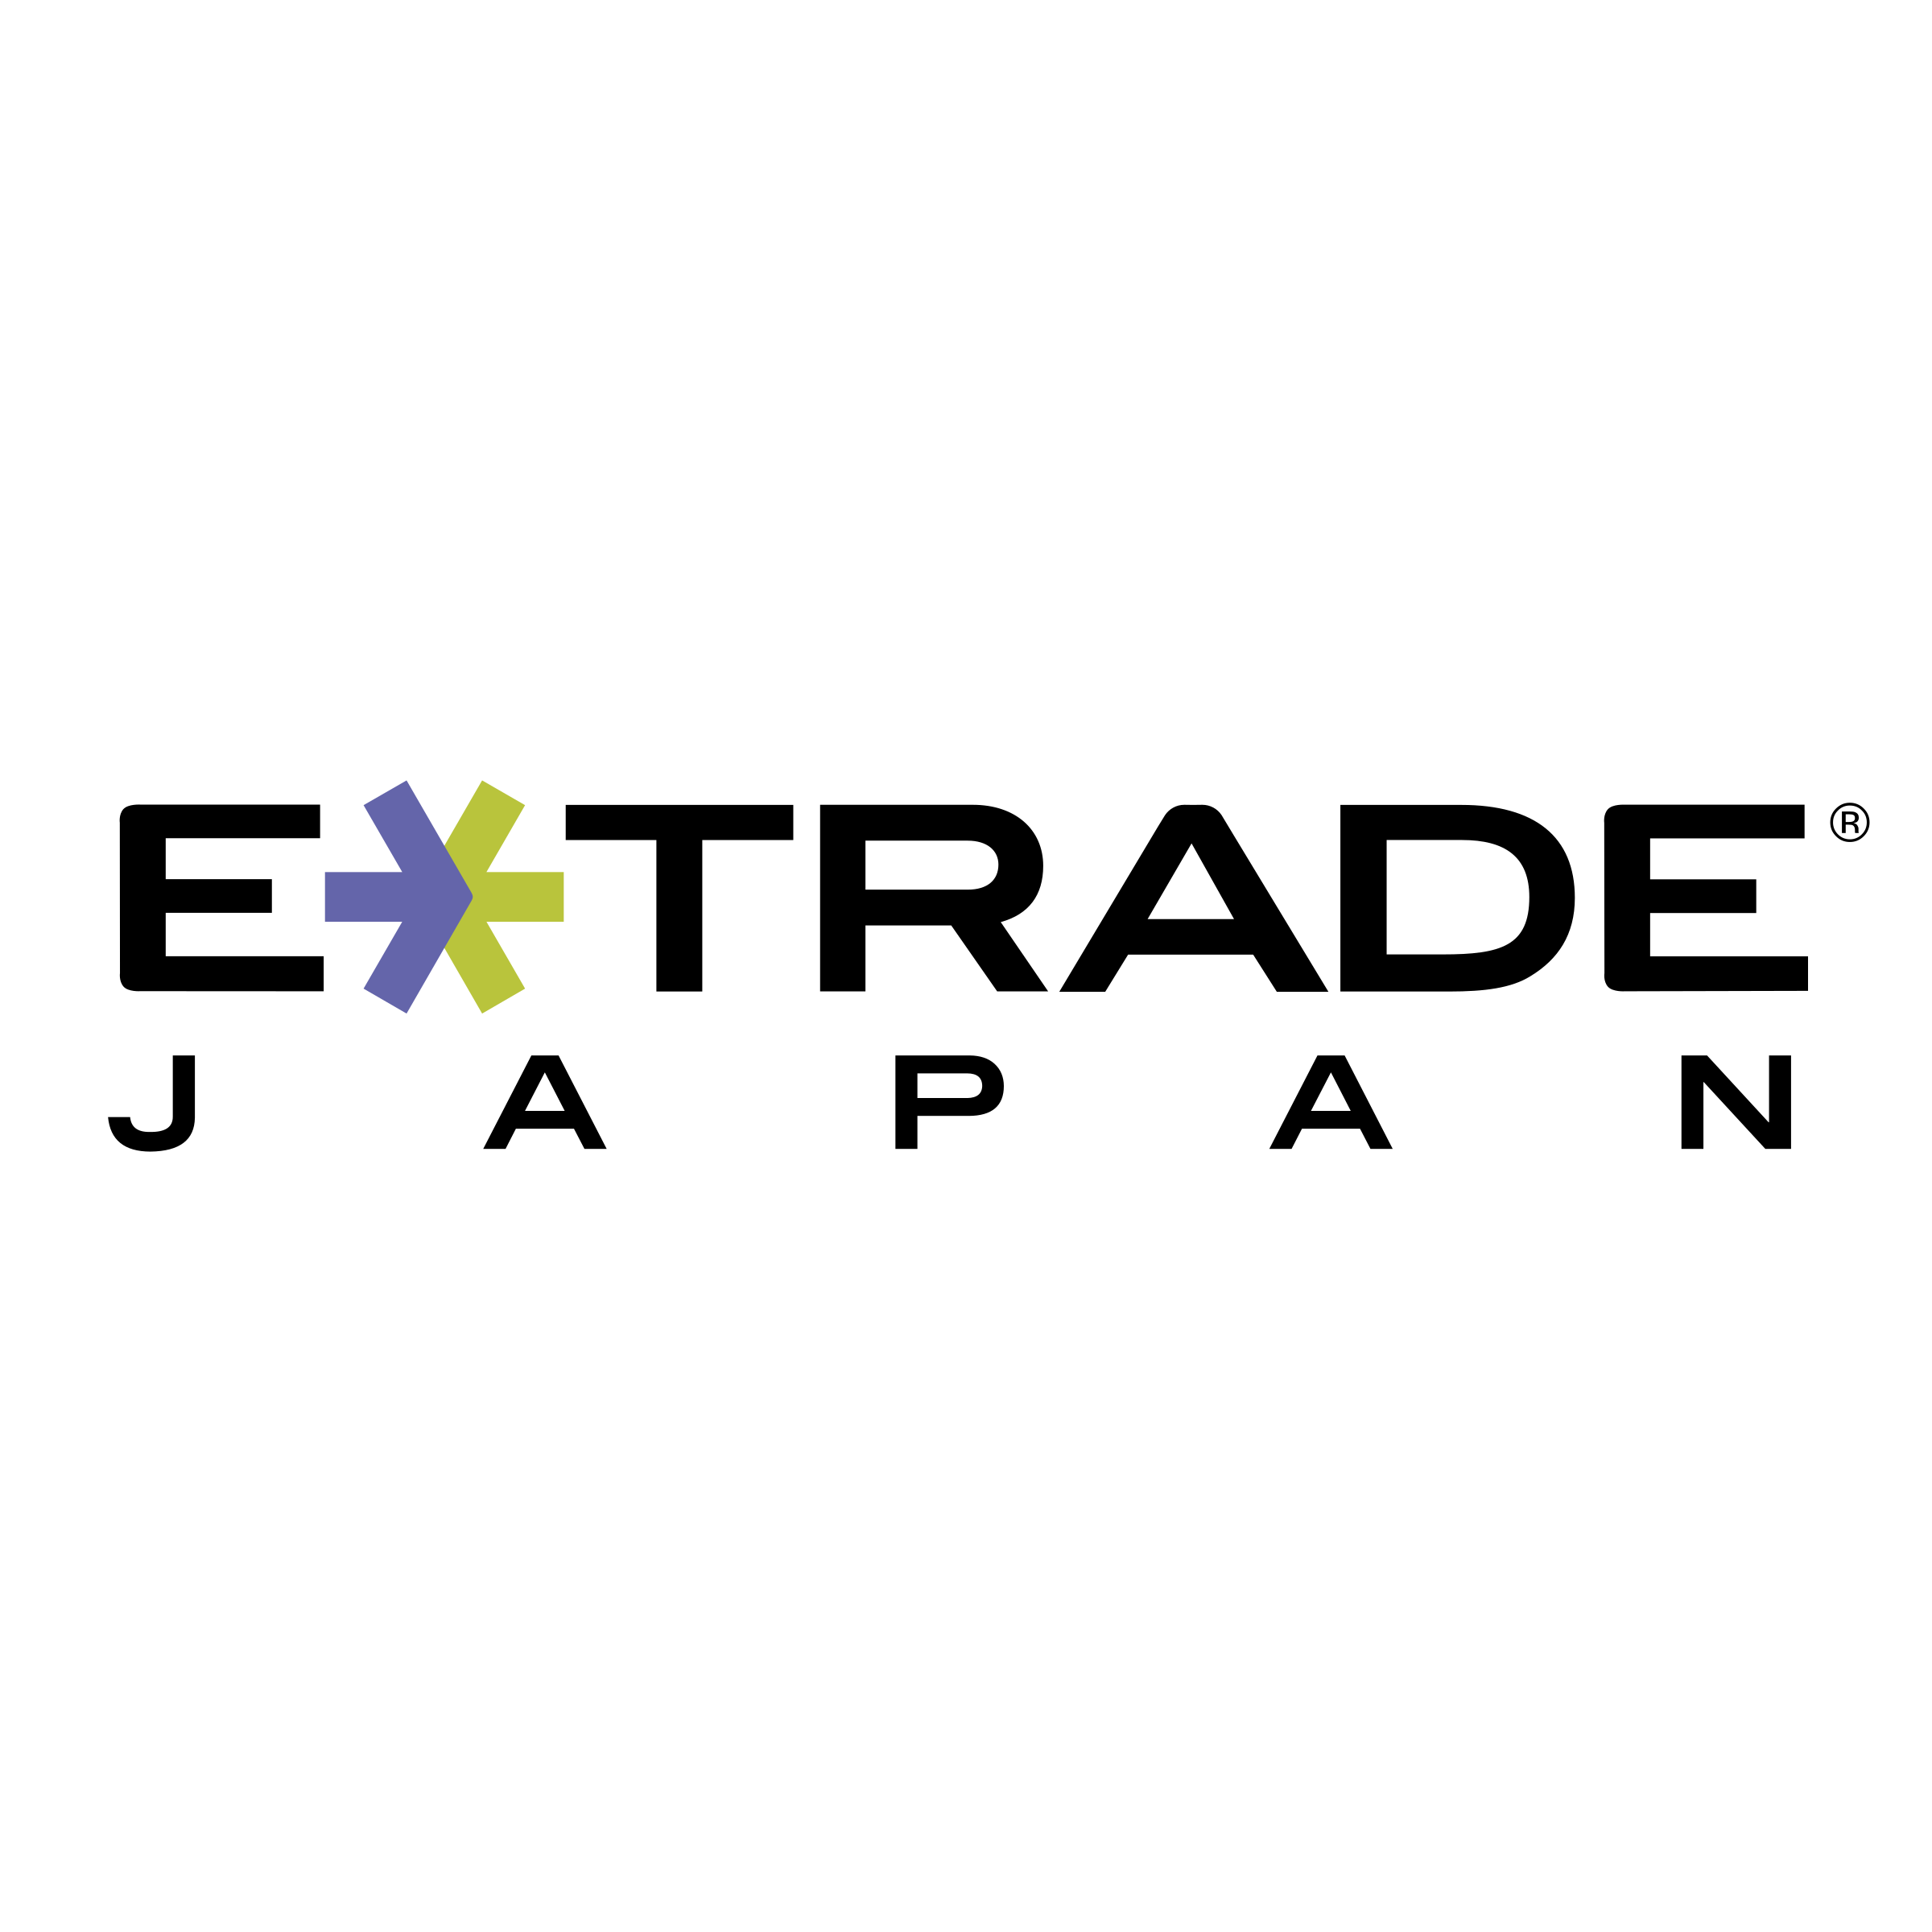 E Trade Japan Logo PNG Transparent & SVG Vector.